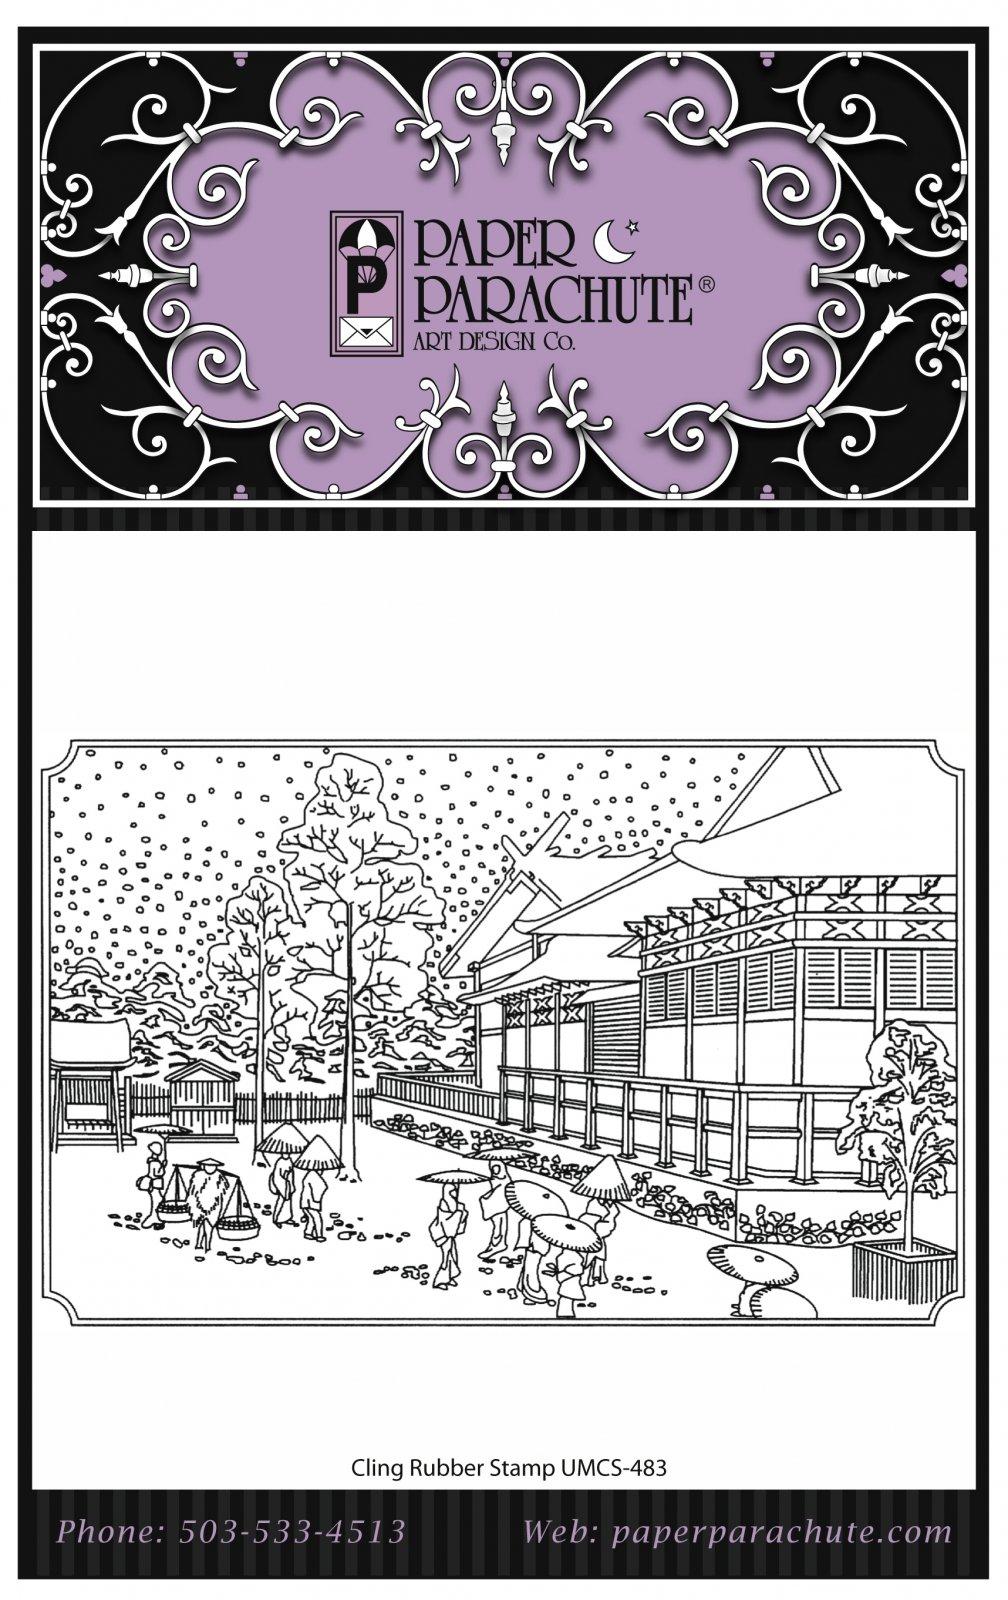 Paper Parachute Rubber Stamp - UMCS483